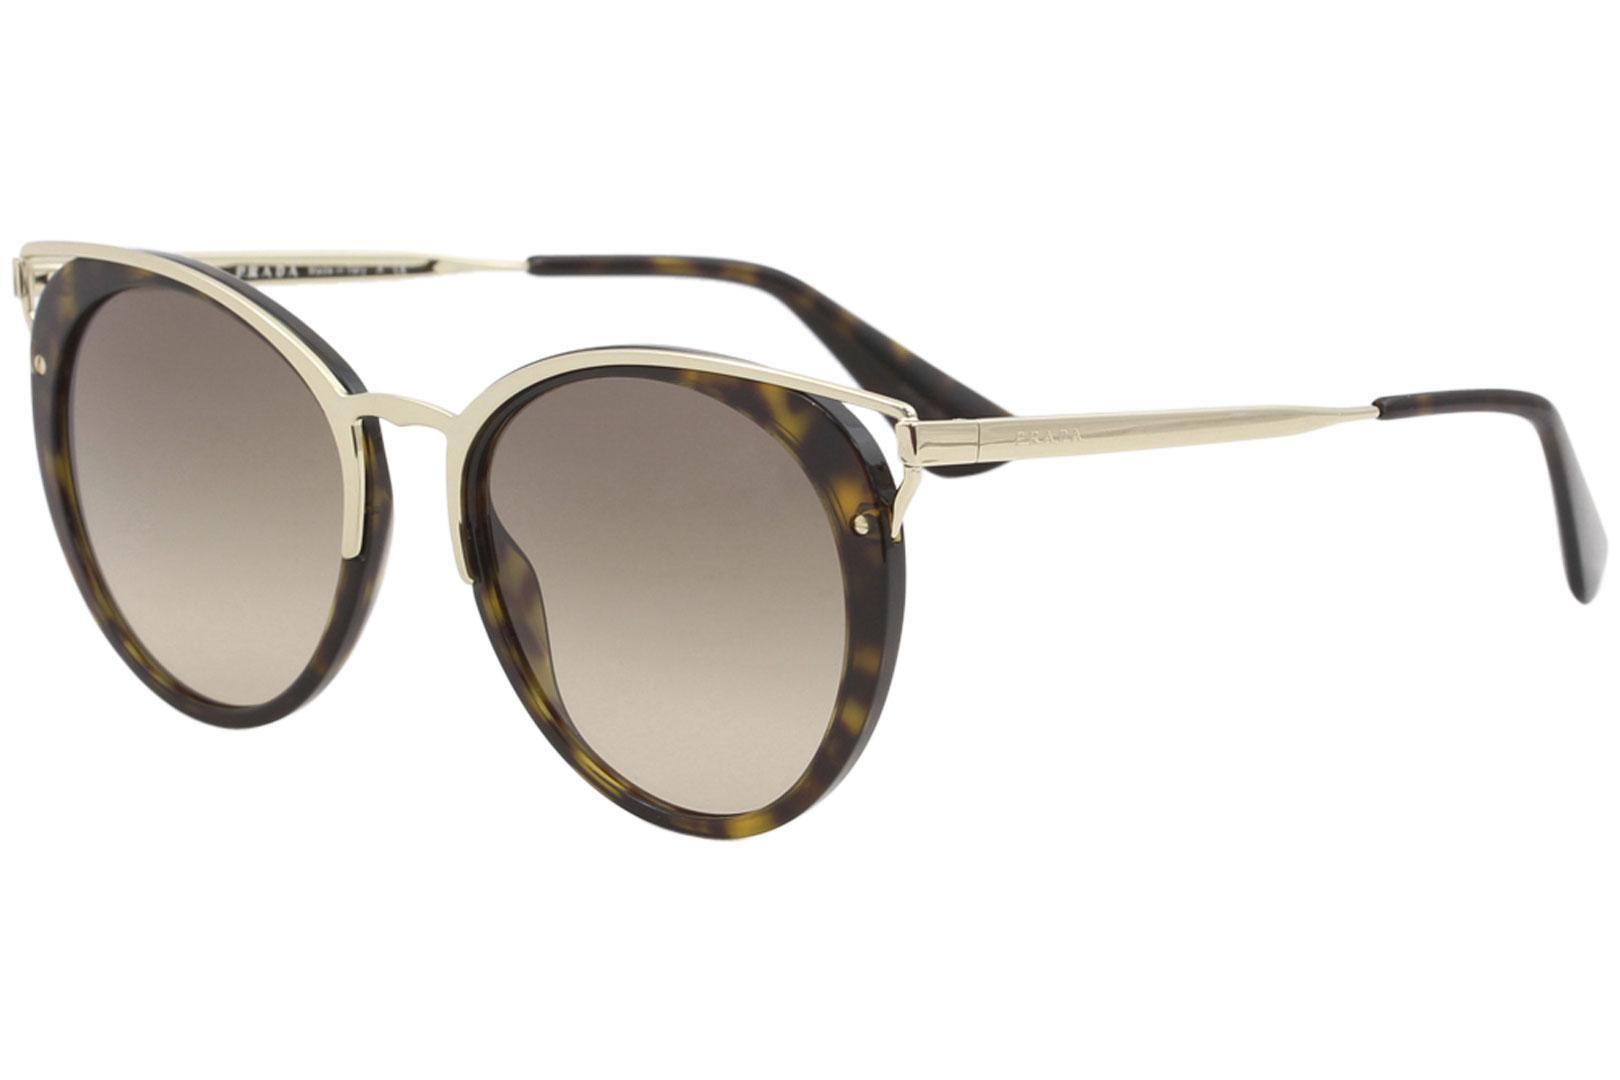 cdbc006f6f Prada Women s SPR66T SPR 66T Fashion Round Sunglasses